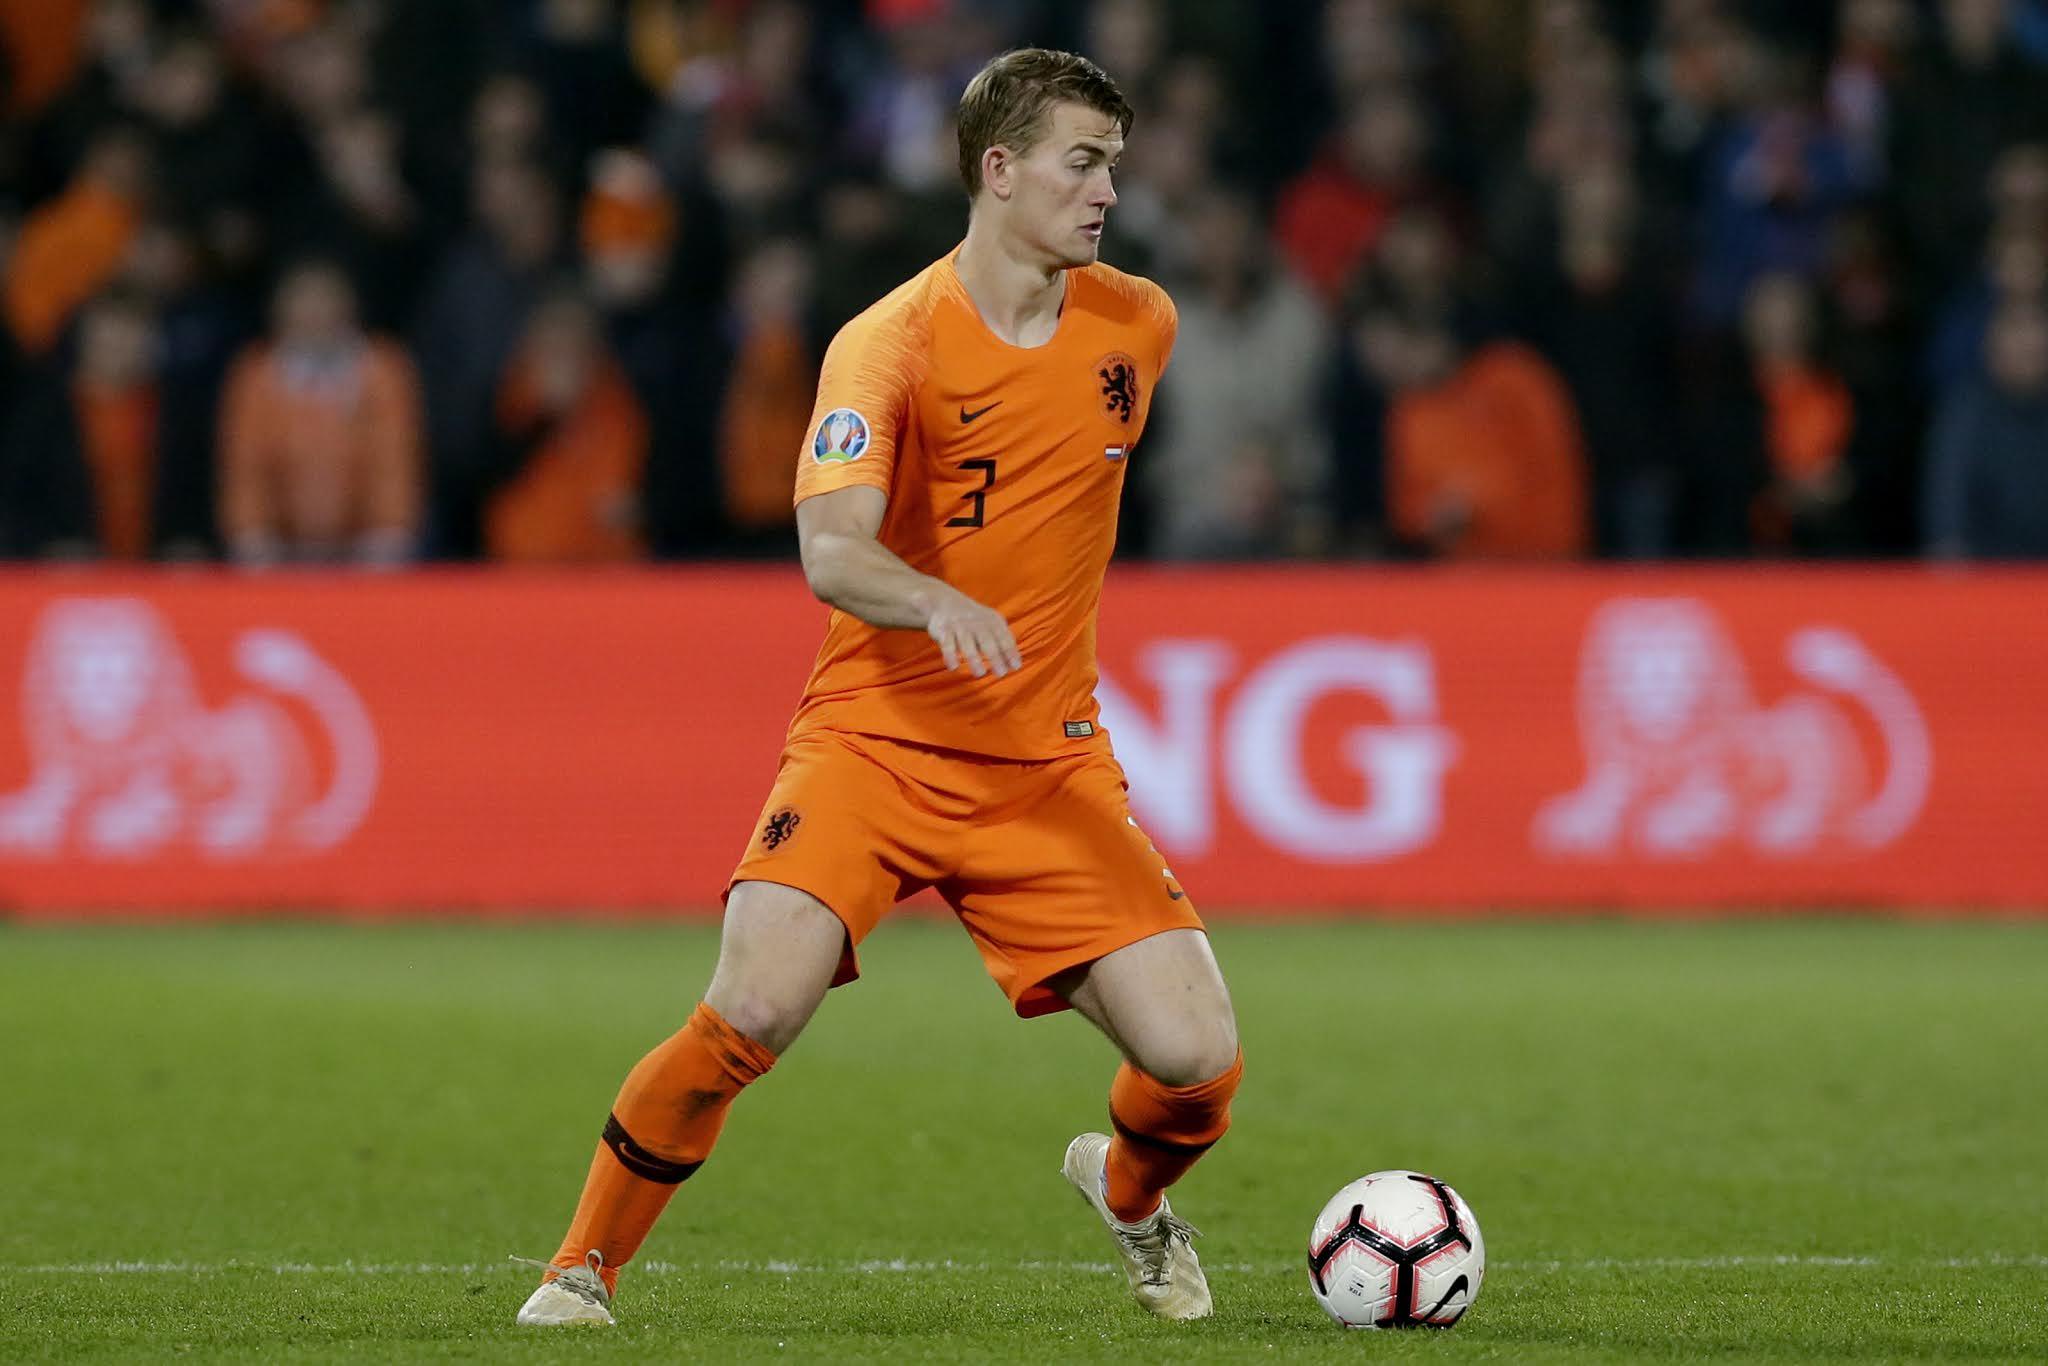 Matthijs de Ligt will have to step up in Virgil van Dijk's absence